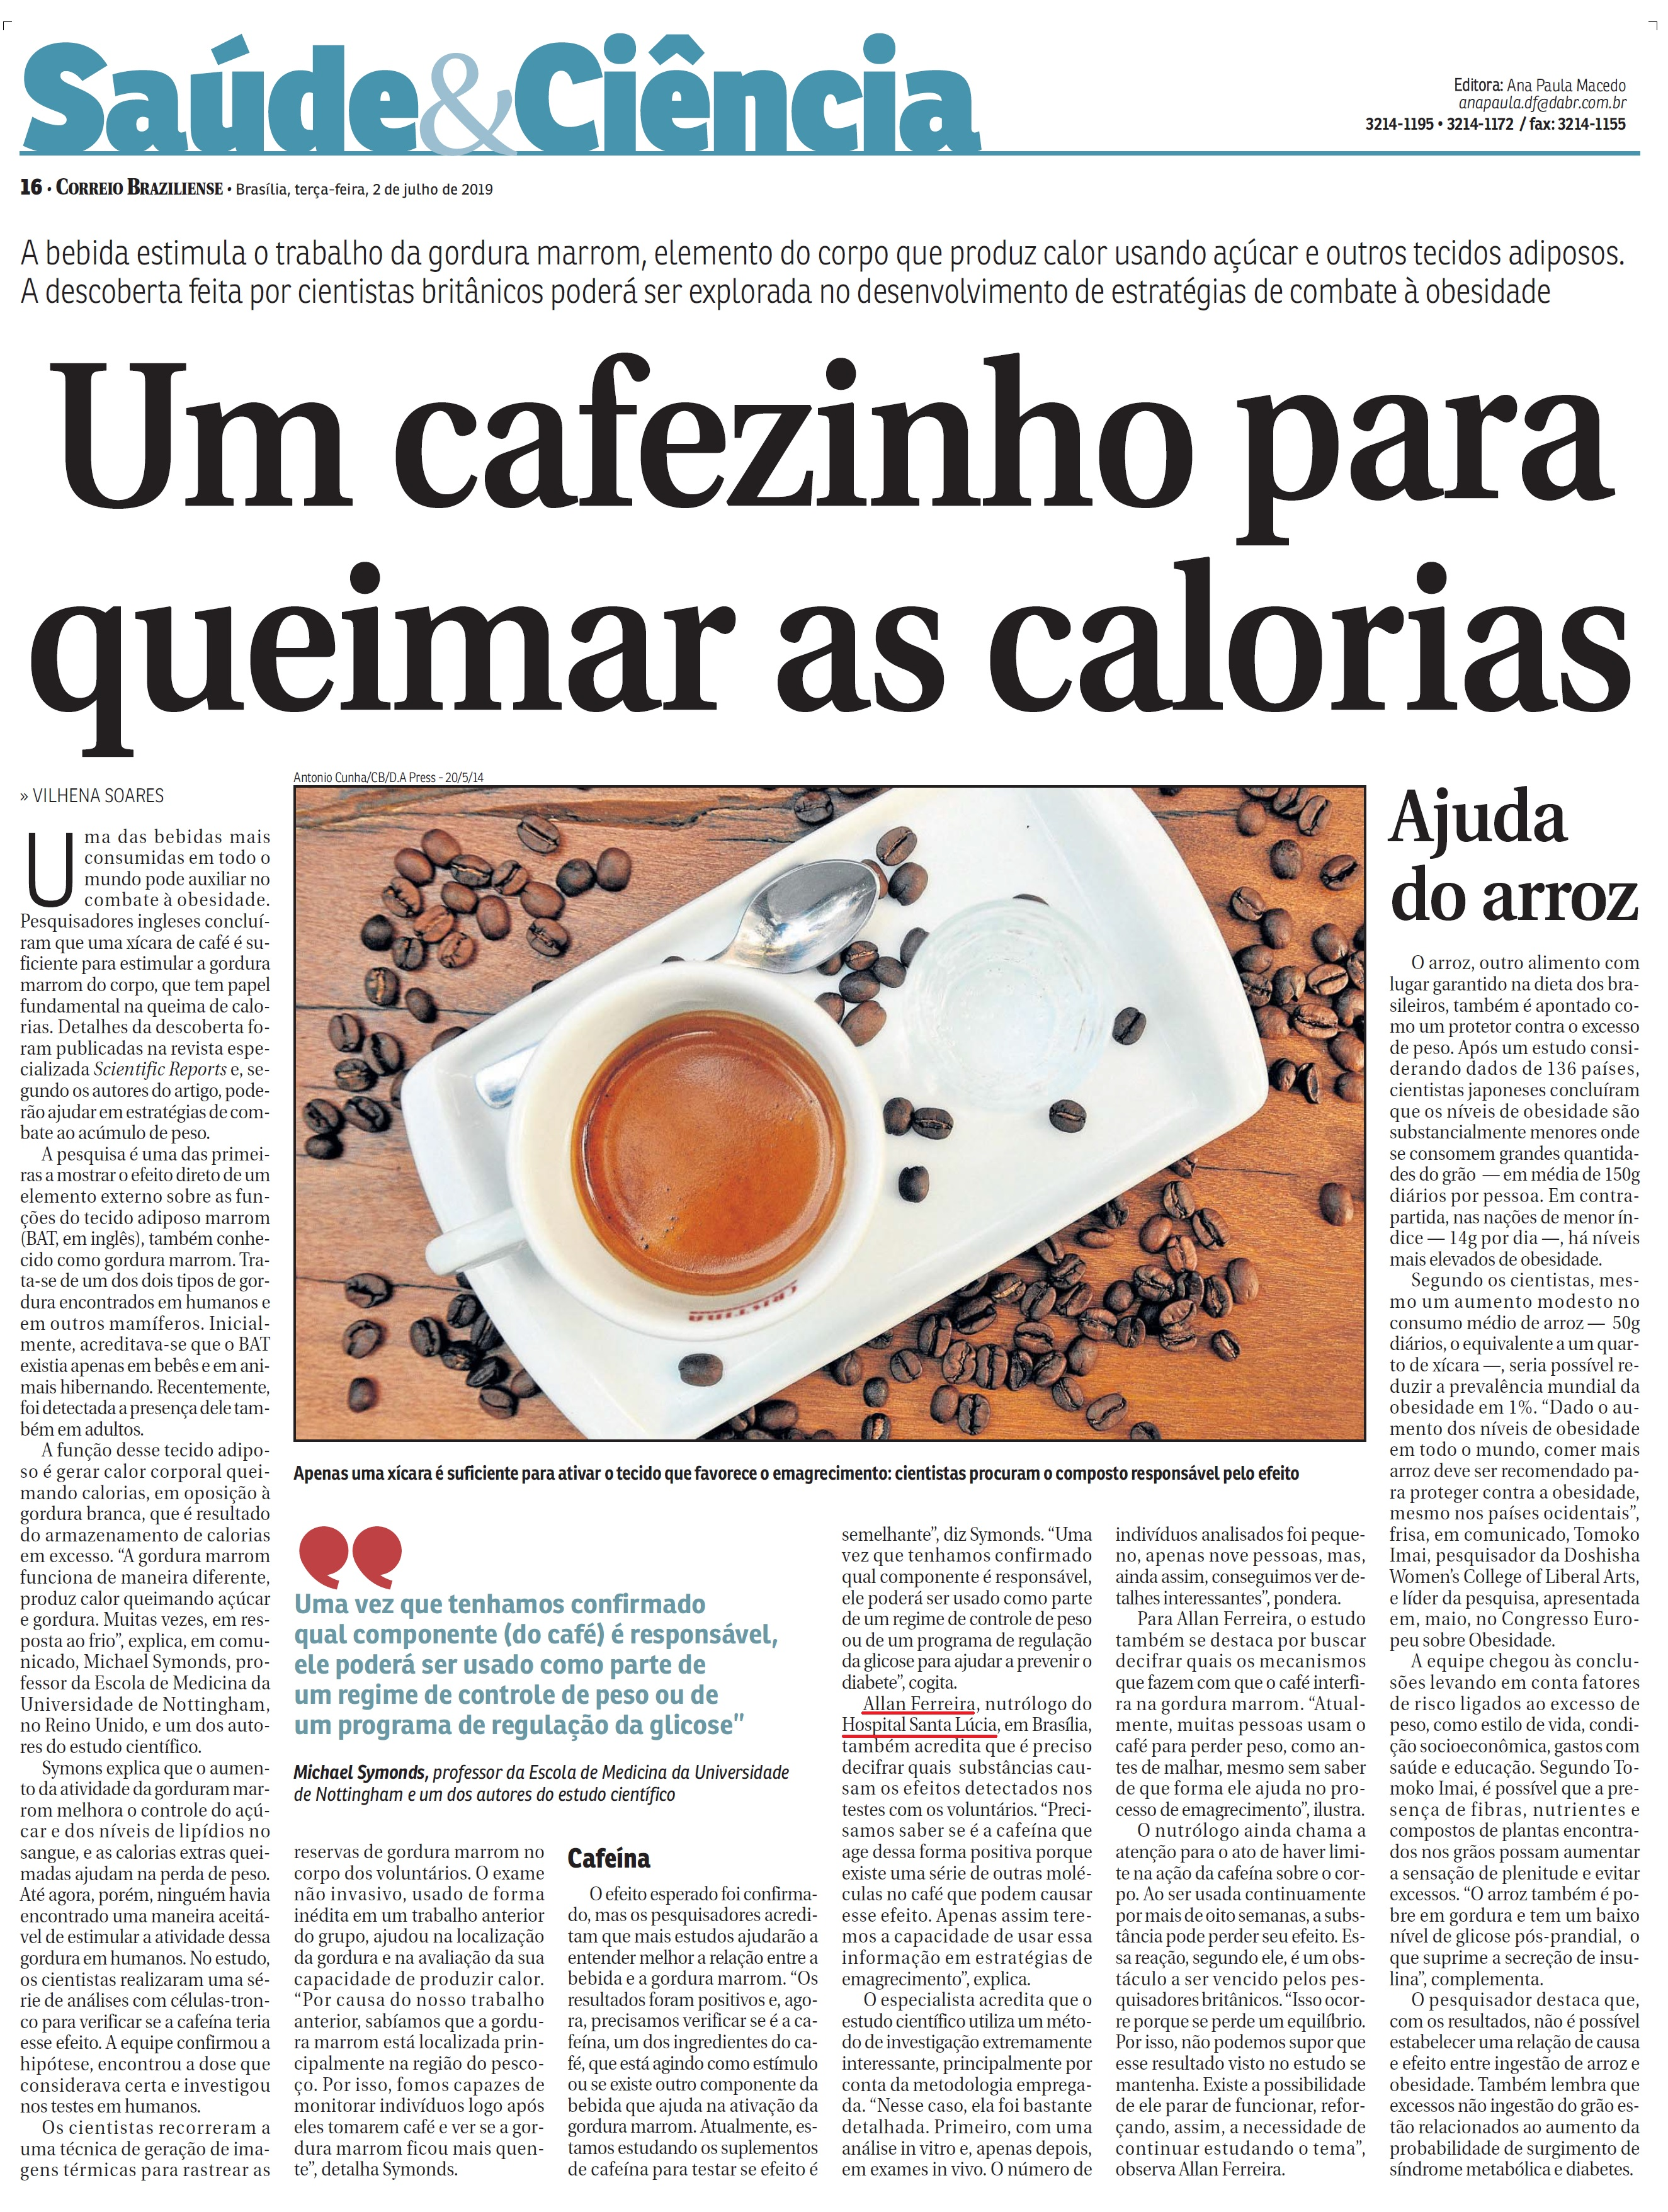 Correio Braziliense - Dr. Allan Ferreira HSLS - 03-07-2019